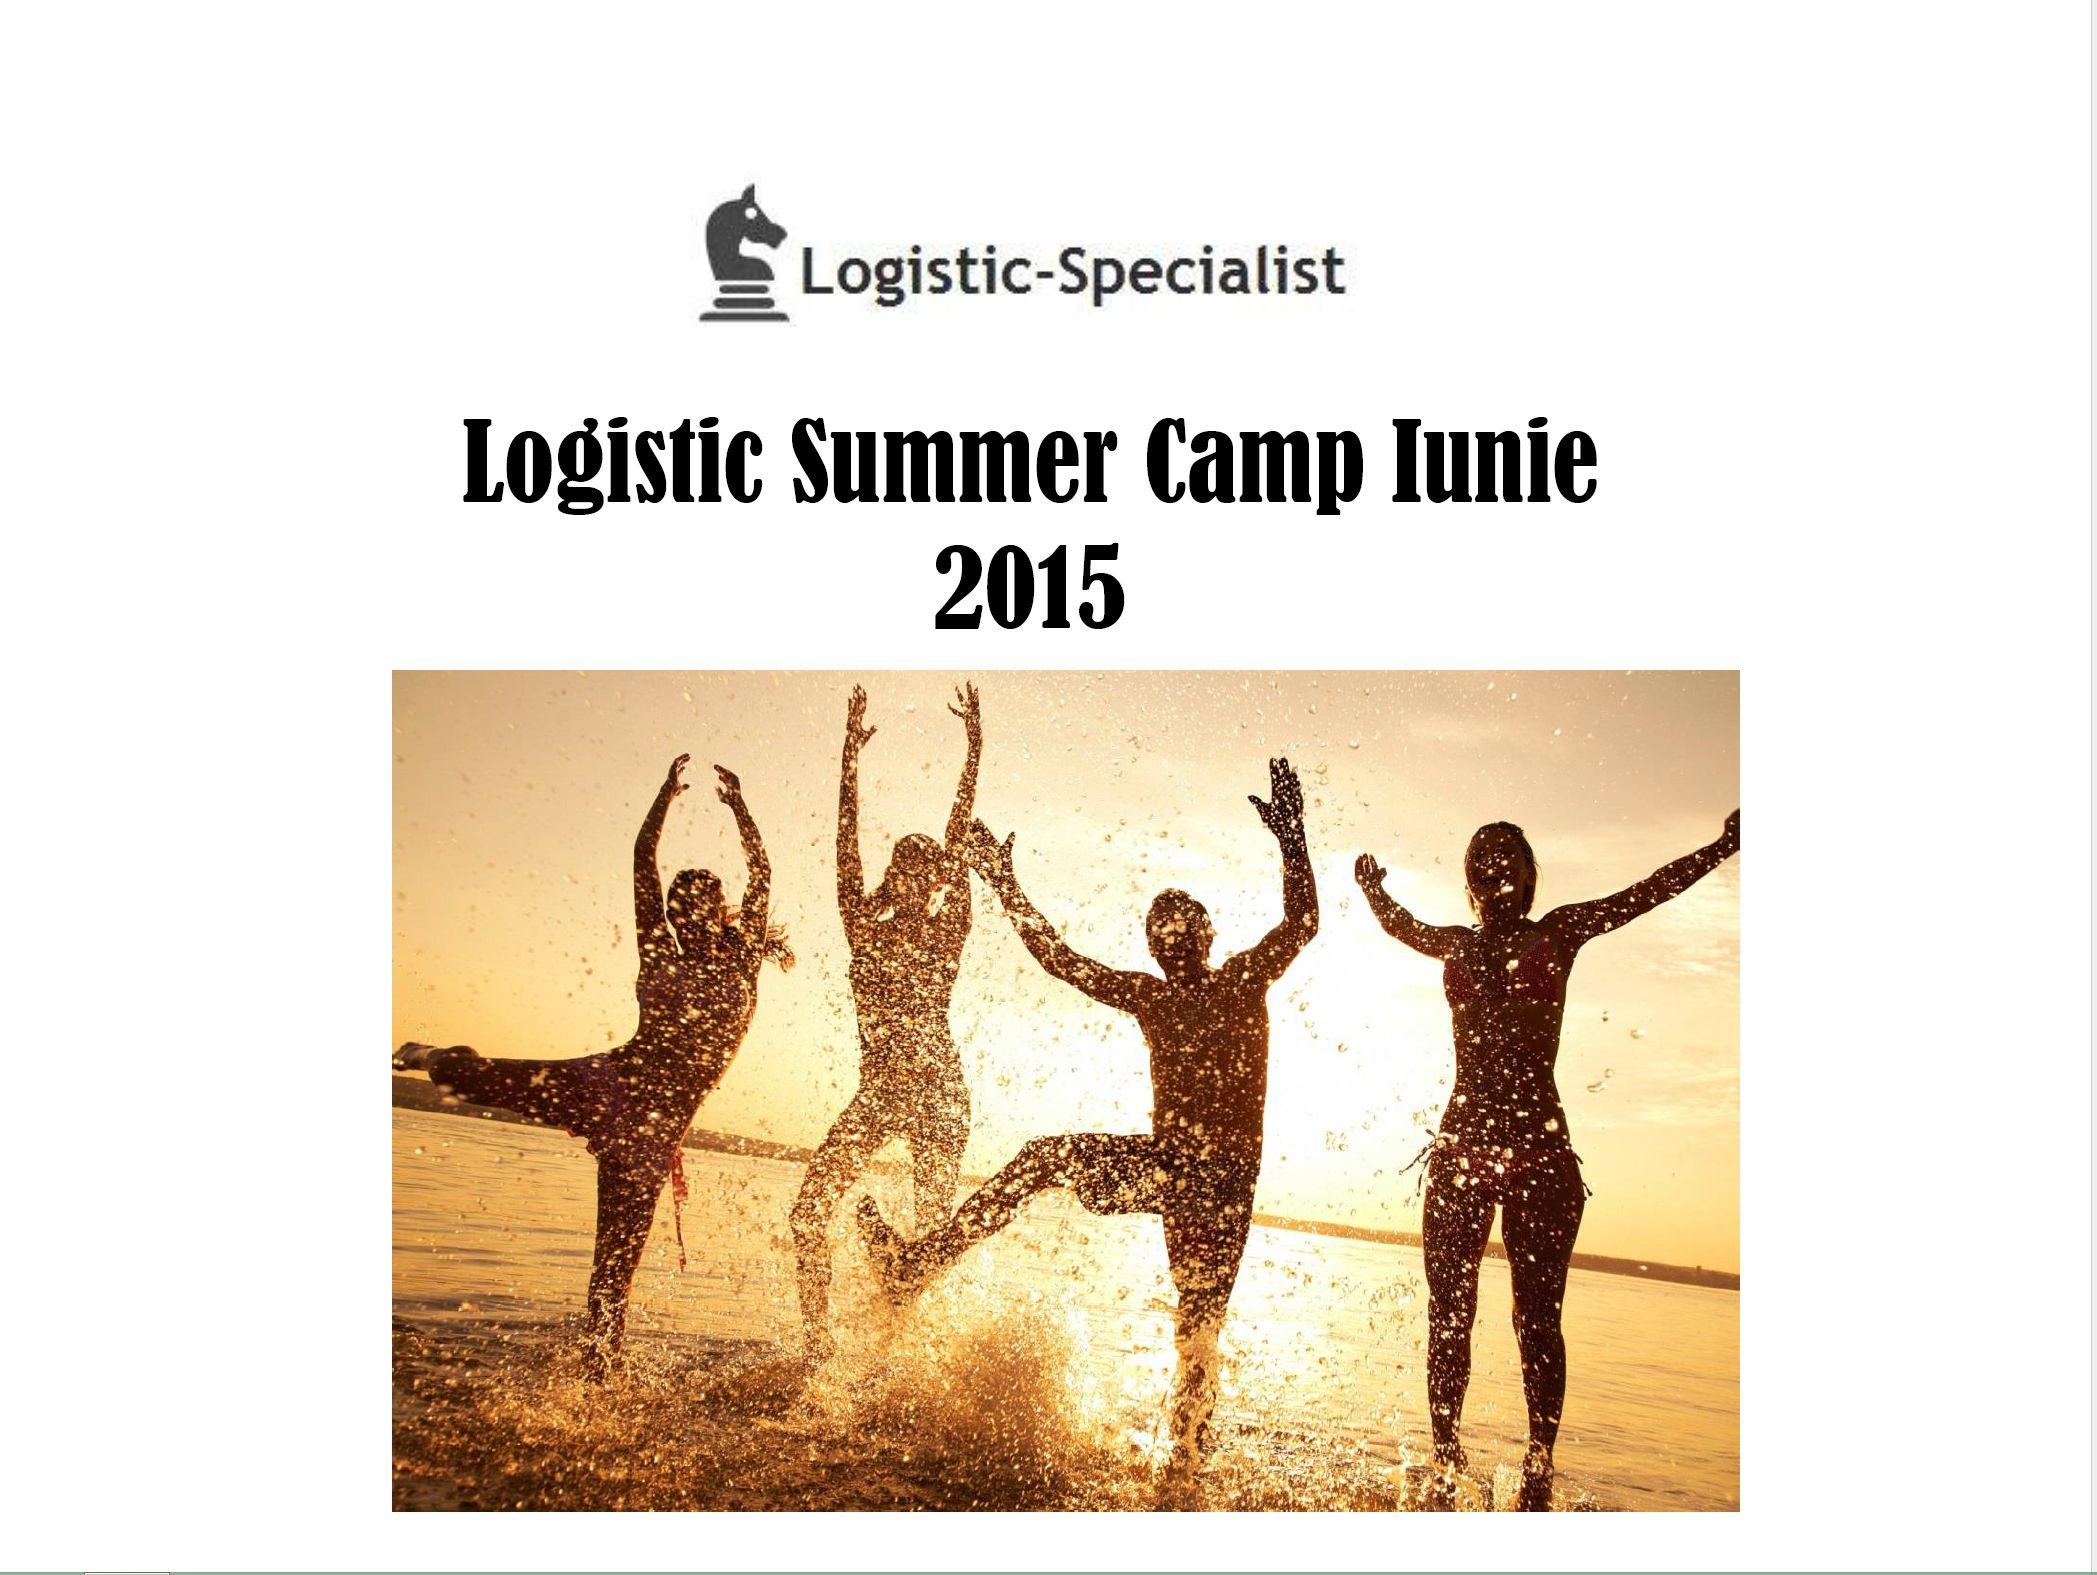 Logistic sumer camp iunie 2015